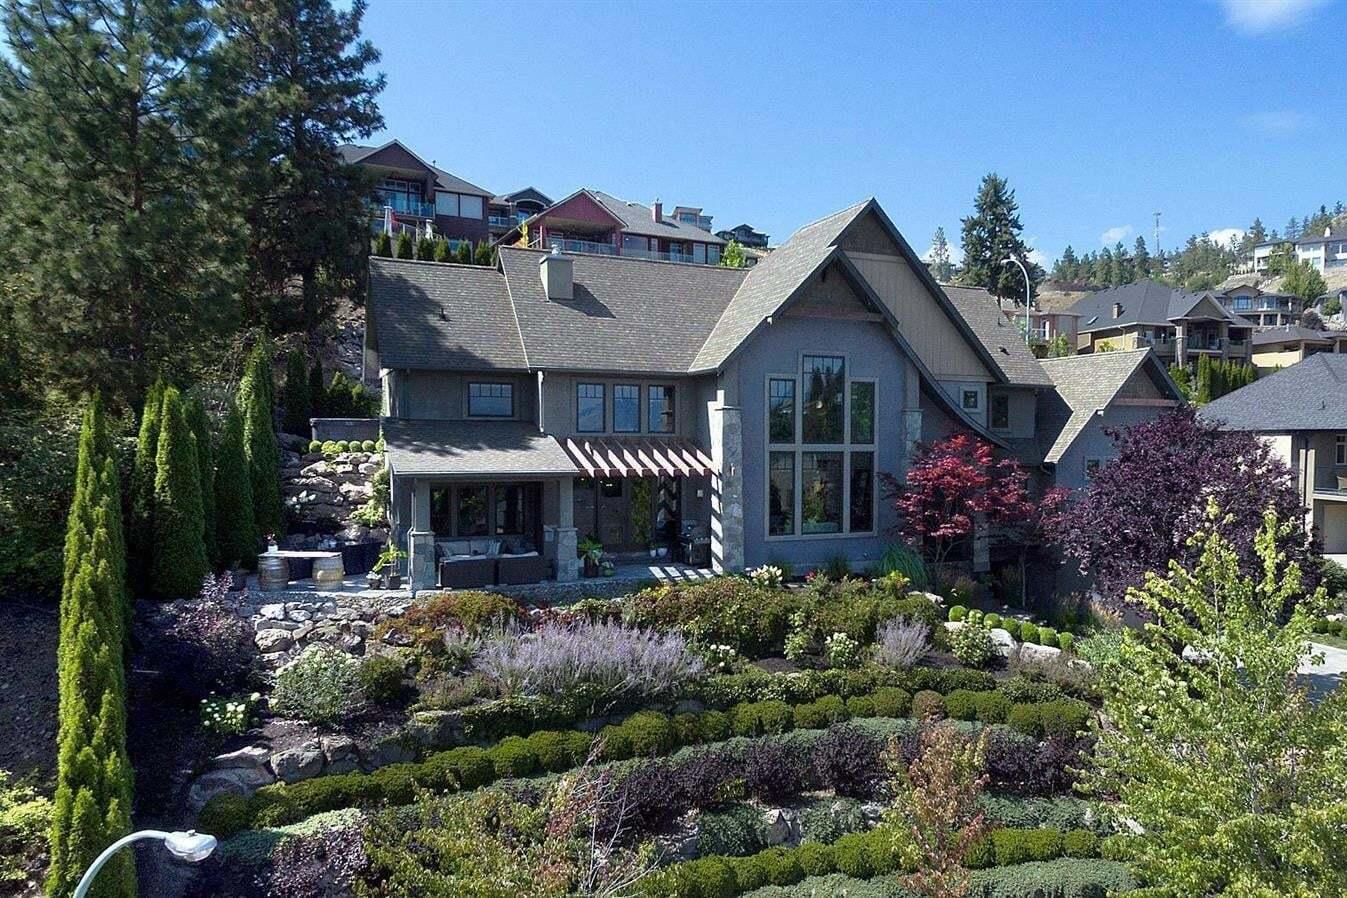 House for sale at 3309 Shiraz Ct West Kelowna British Columbia - MLS: 10214588